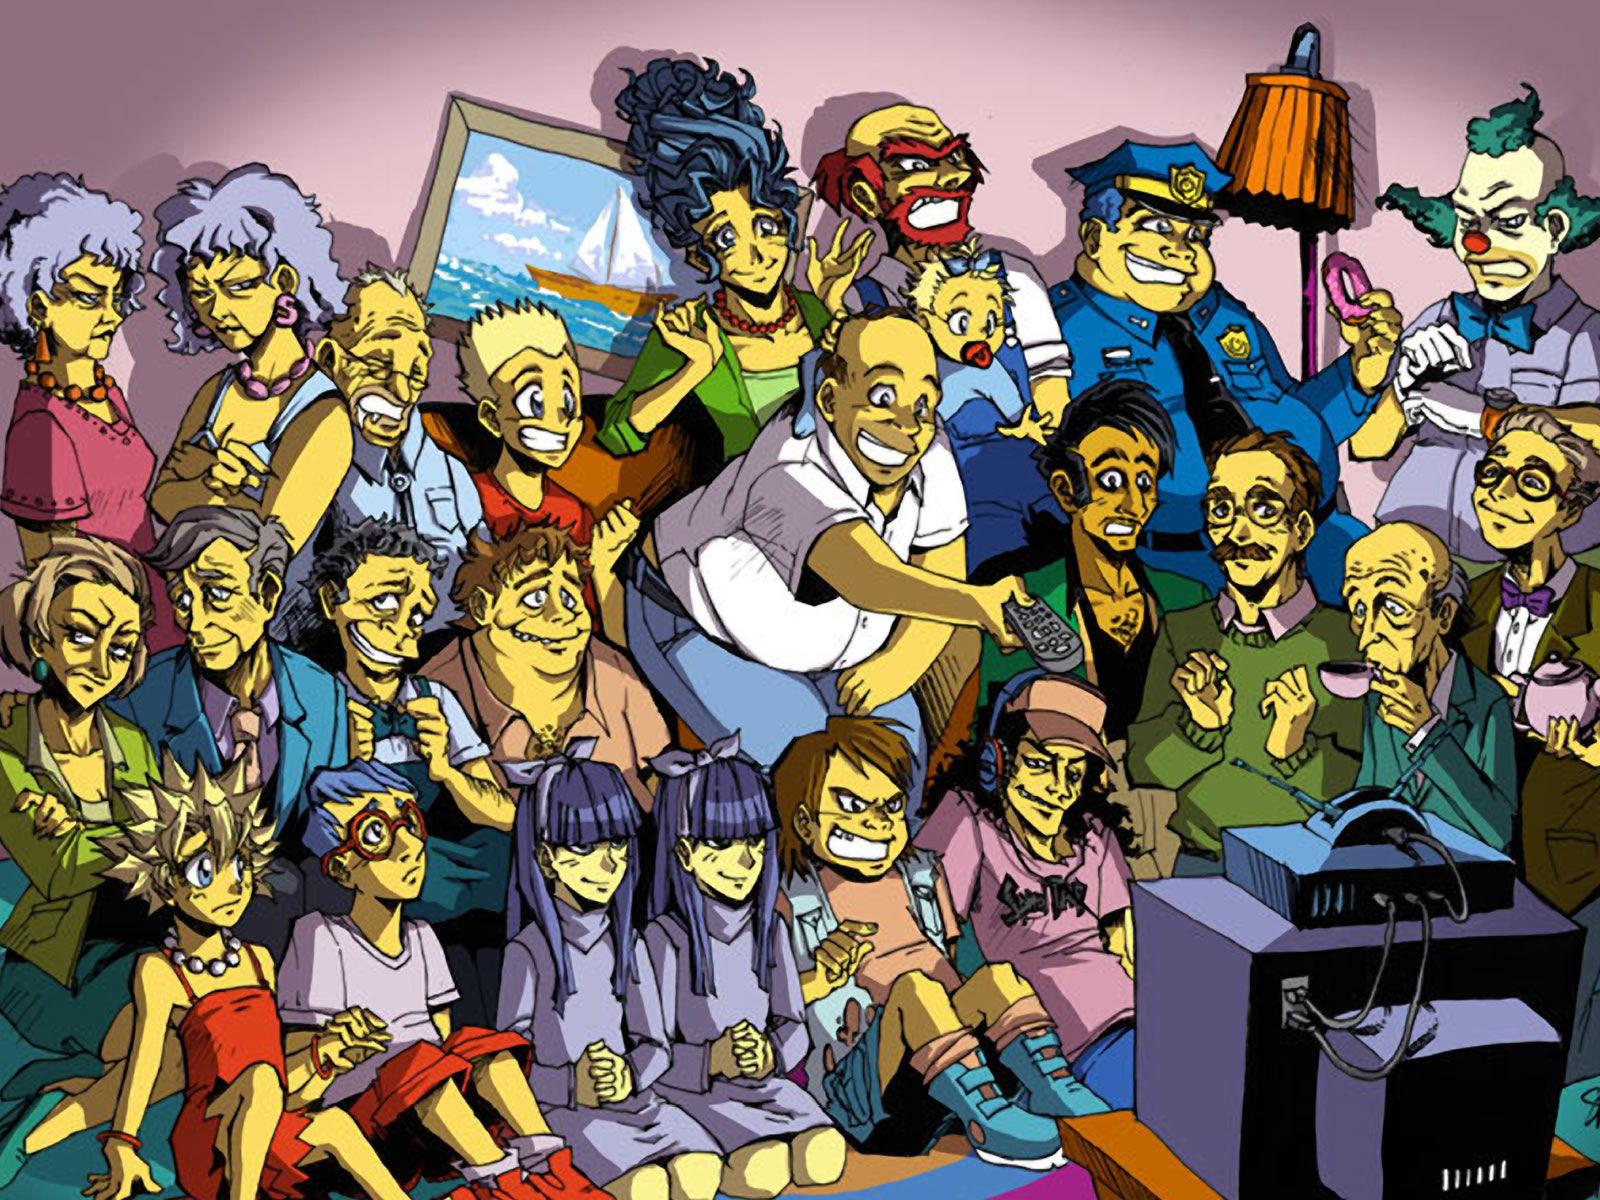 Programa  - Los Simpsons  - Simpsons Fondo de Pantalla